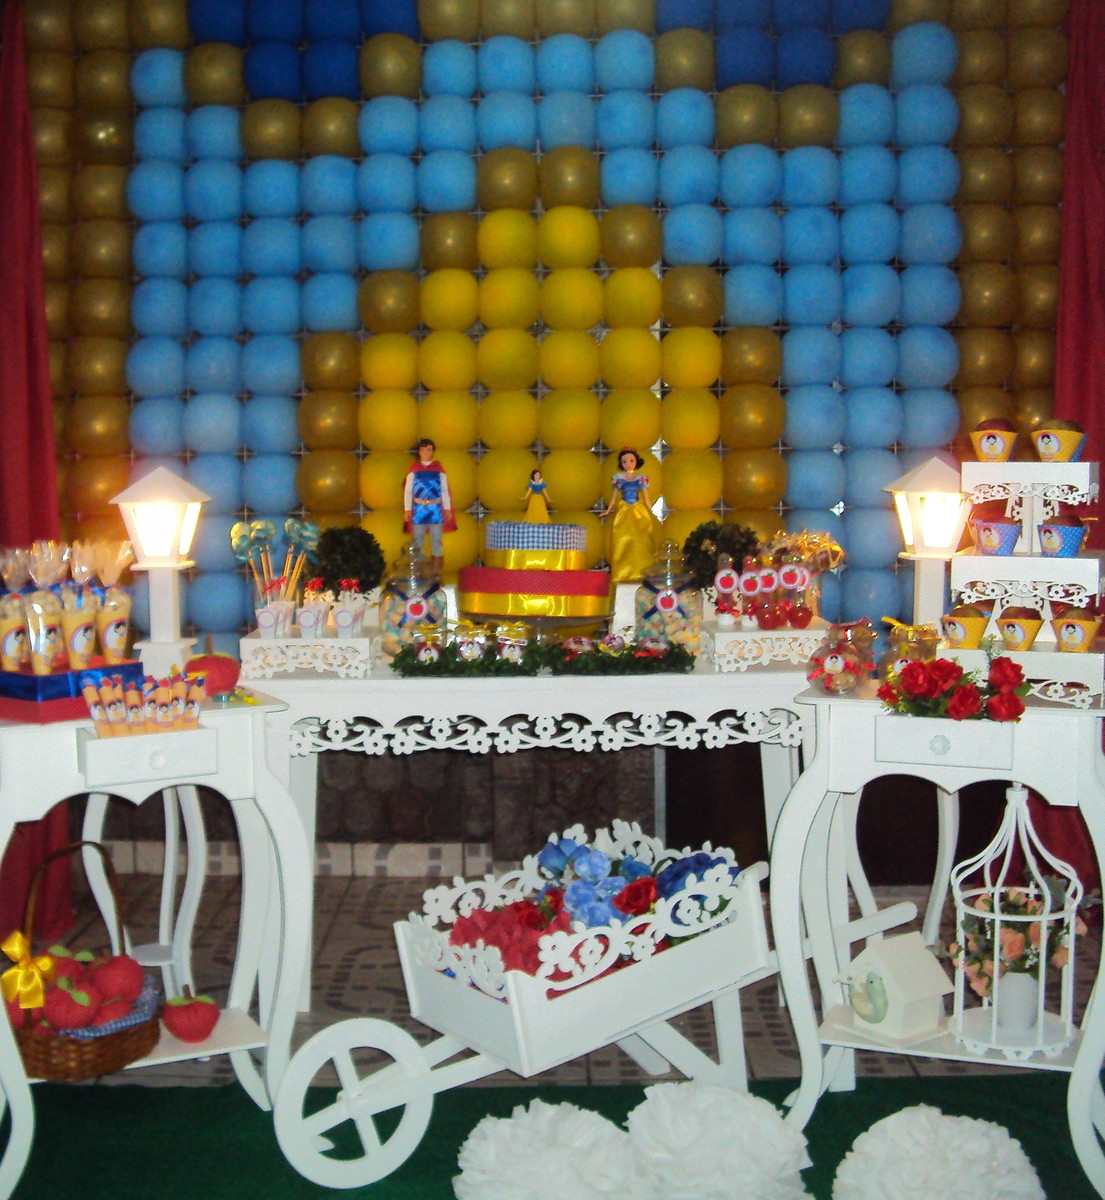 decoracao festa branca de neve provencal:festa provencal branca de neve decoracao festa provencal branca de